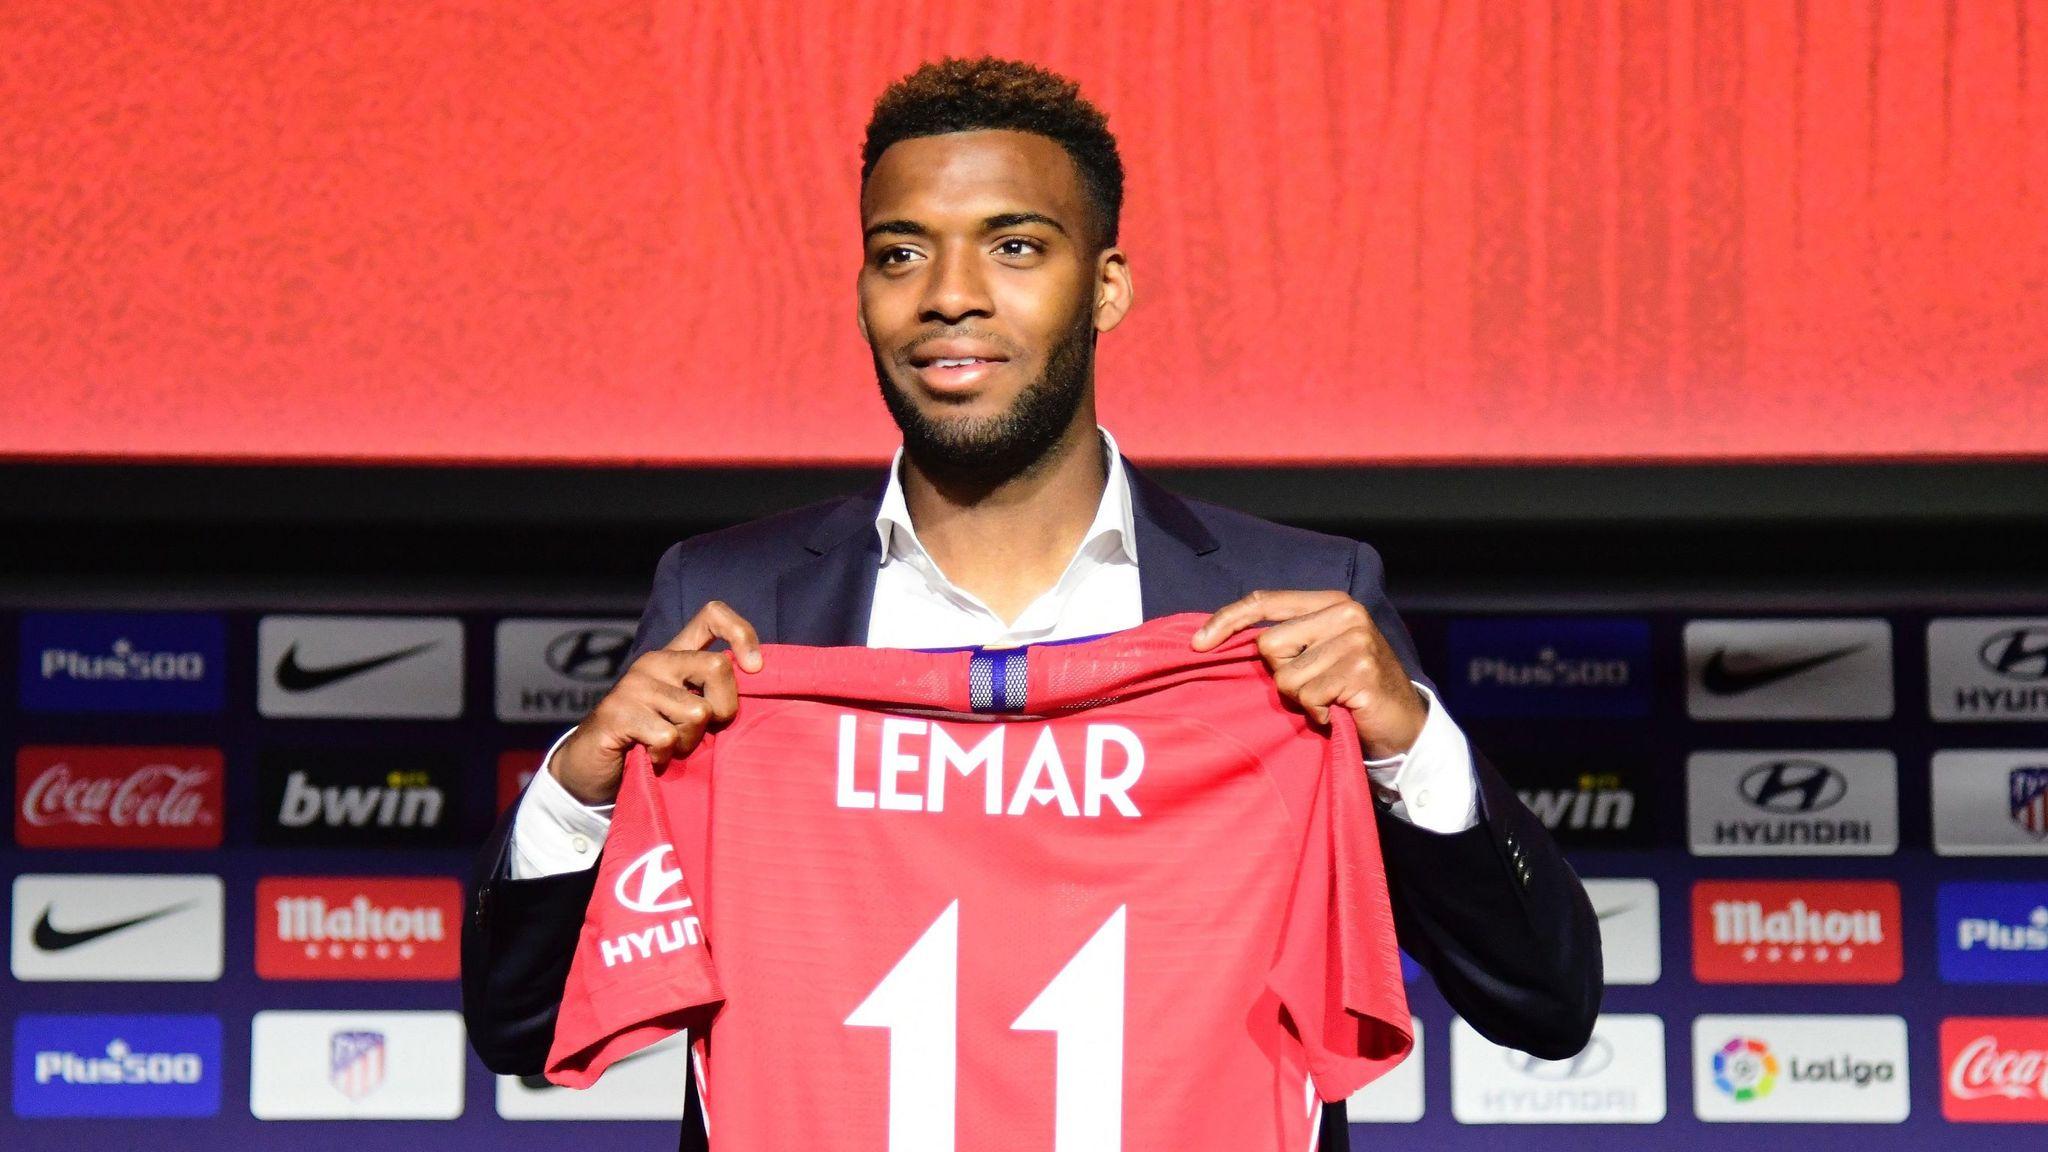 Thomas Lemar Very Happy After Joining Atletico Madrid From Monaco Football News Sky Sports